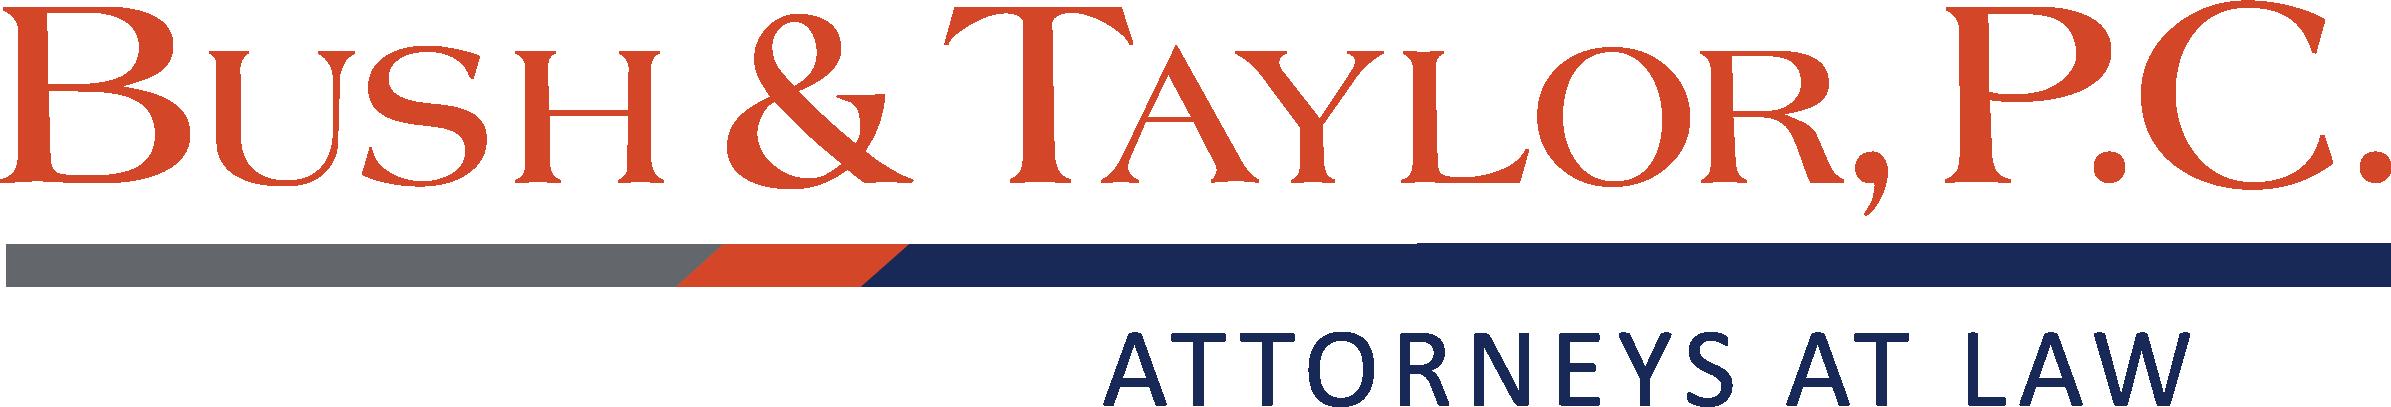 Bush_Taylor logo.png